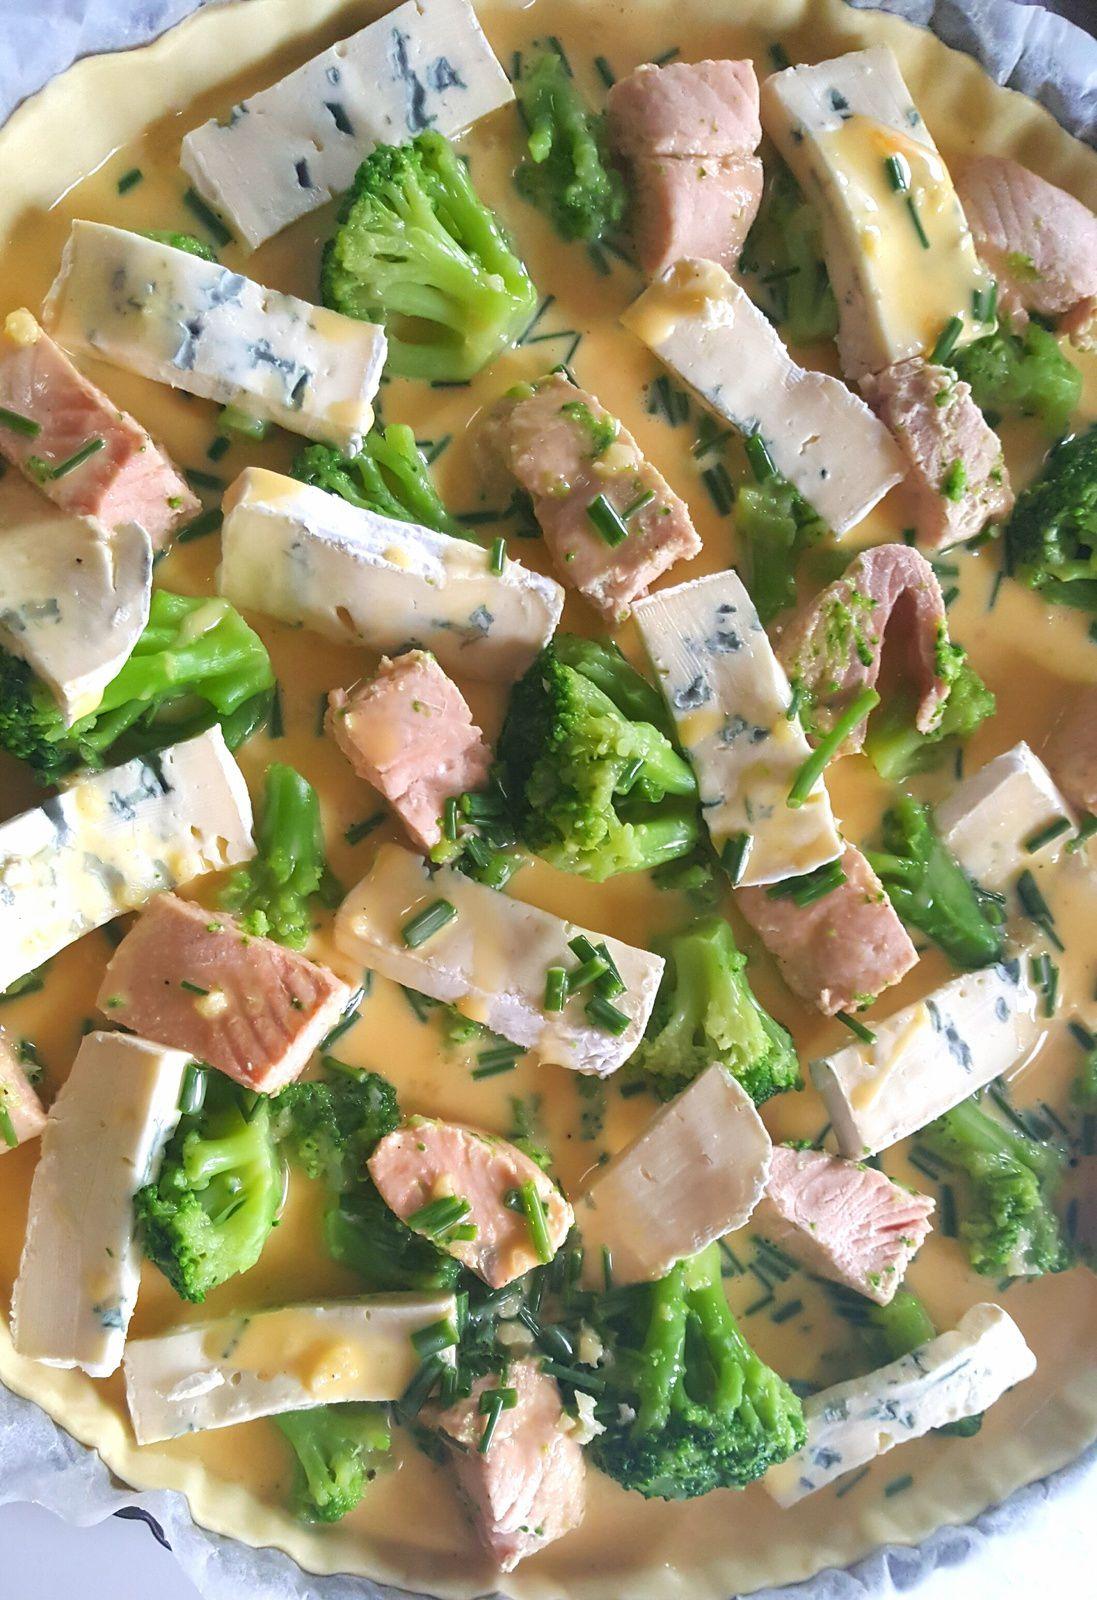 Tarte au Saumon, Brocoli et Bleu